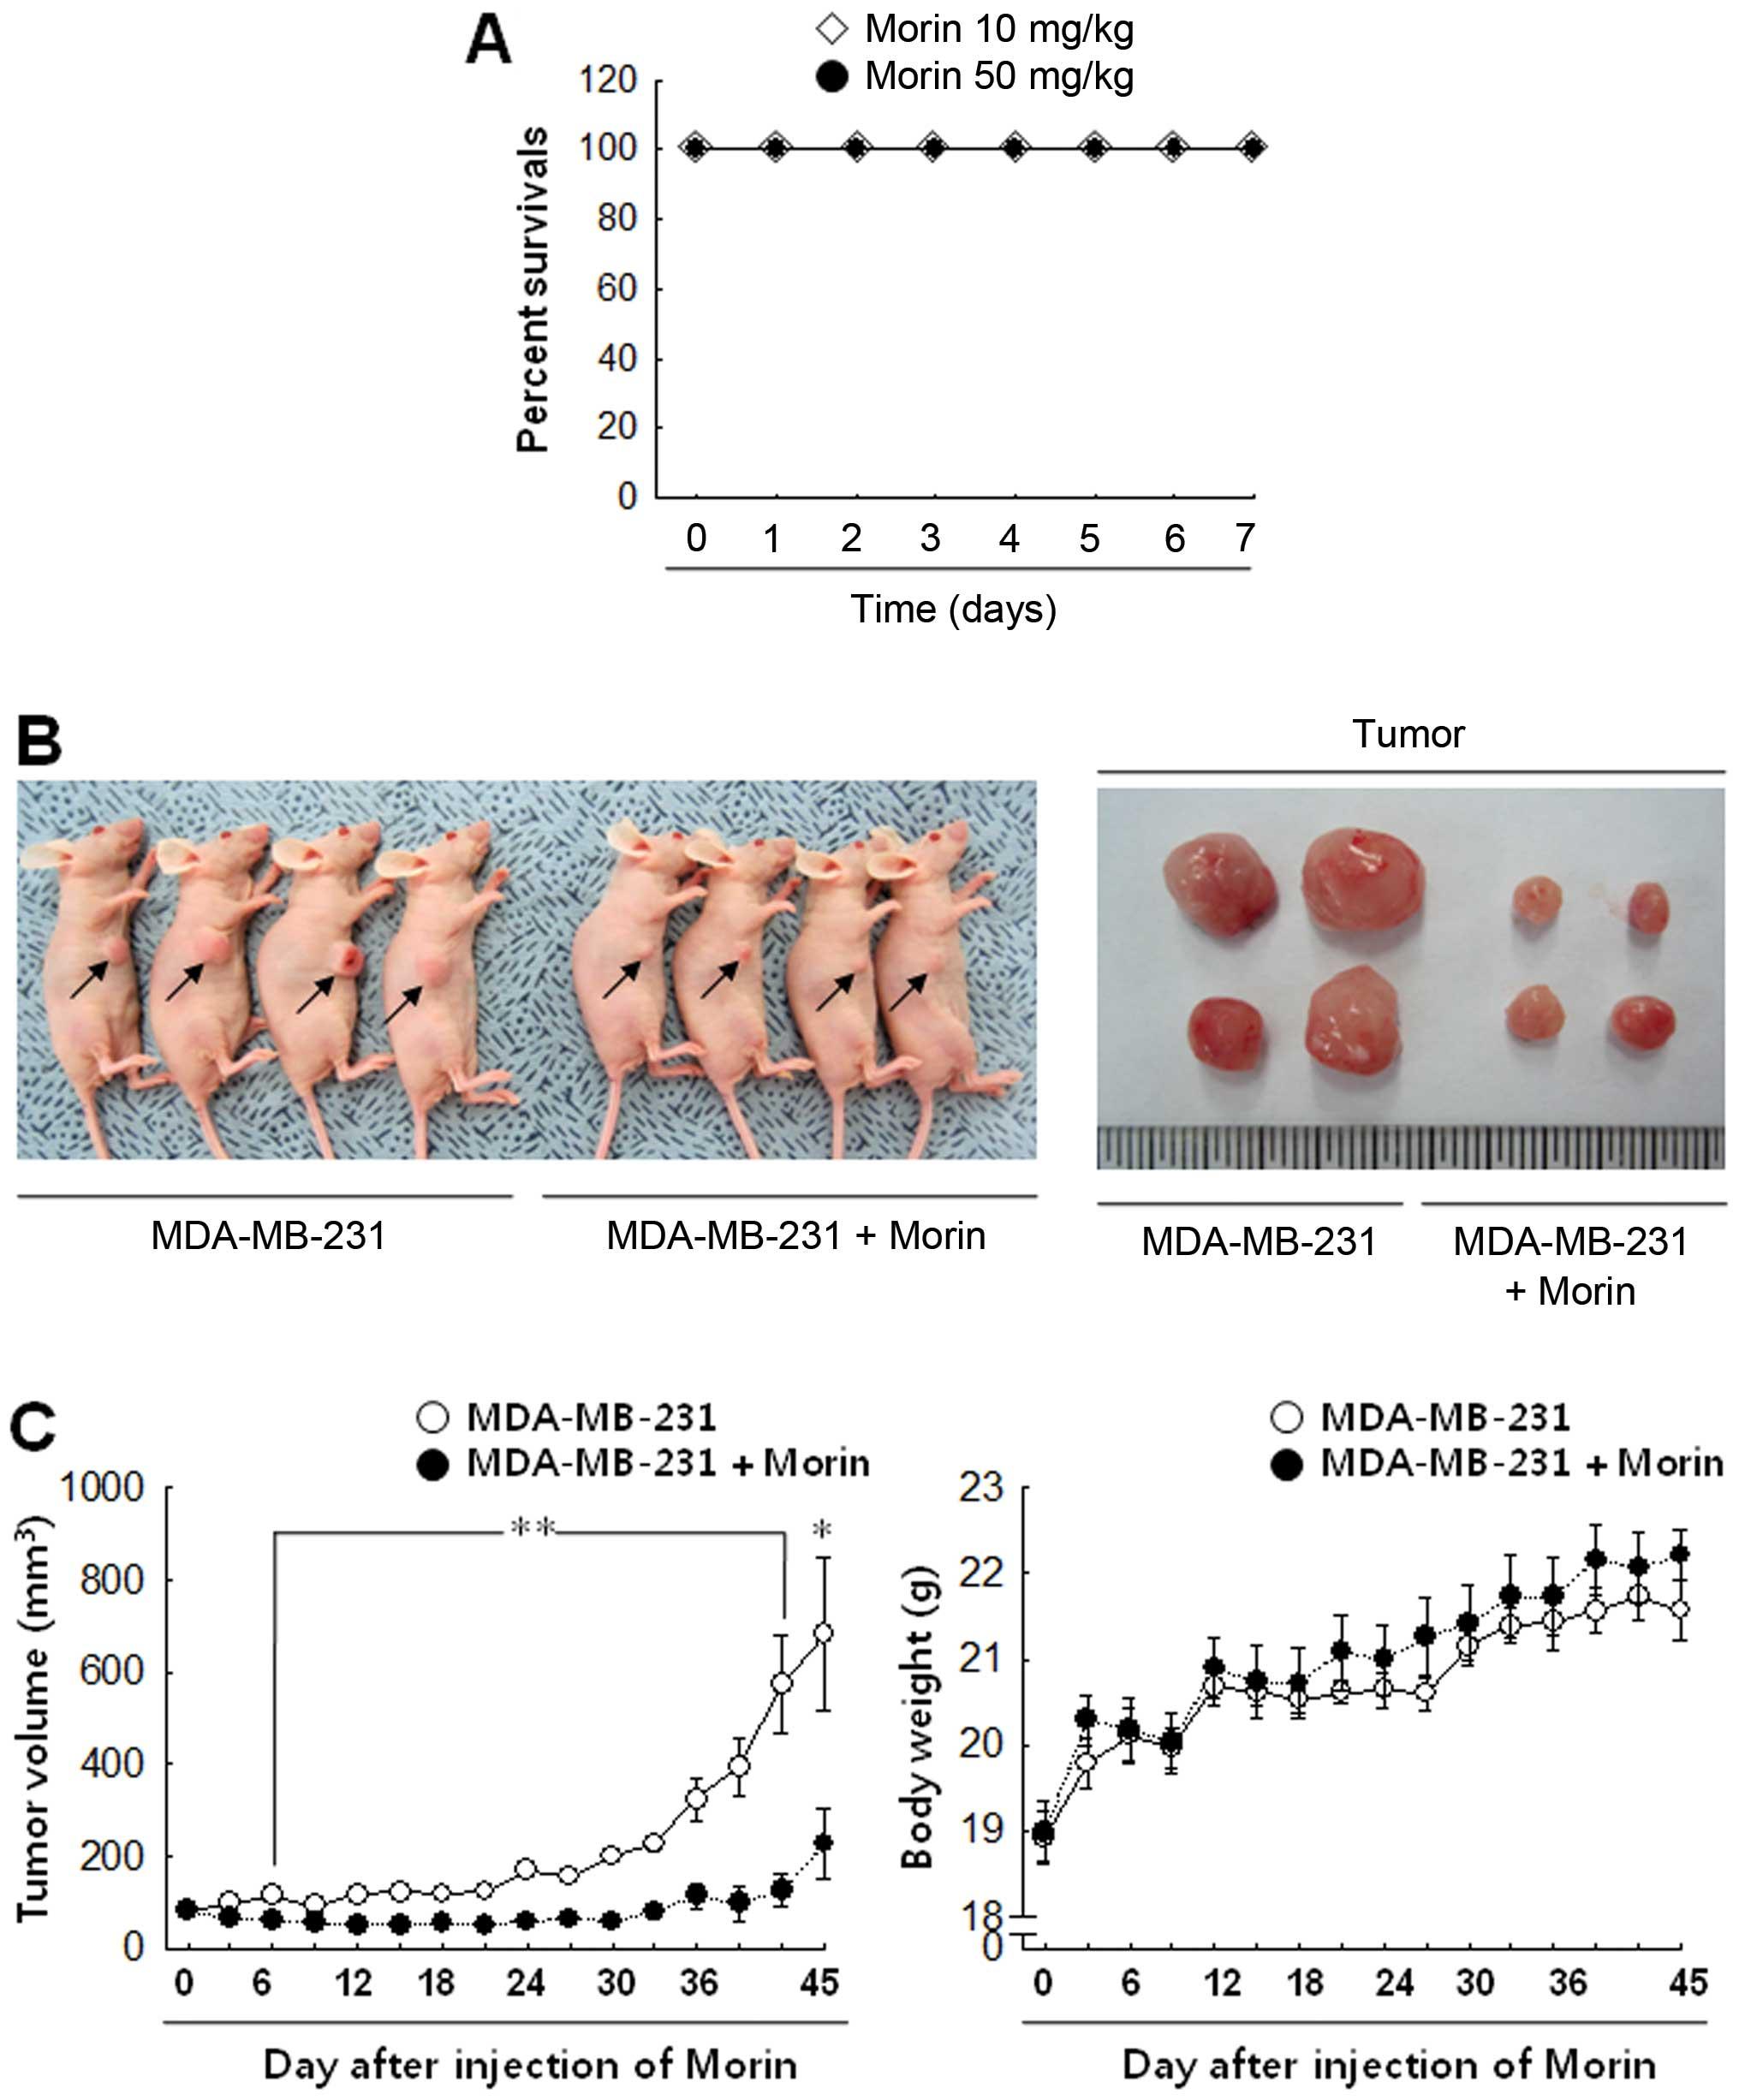 tehnica de tratament cu paraziti anthelmintic agent meaning